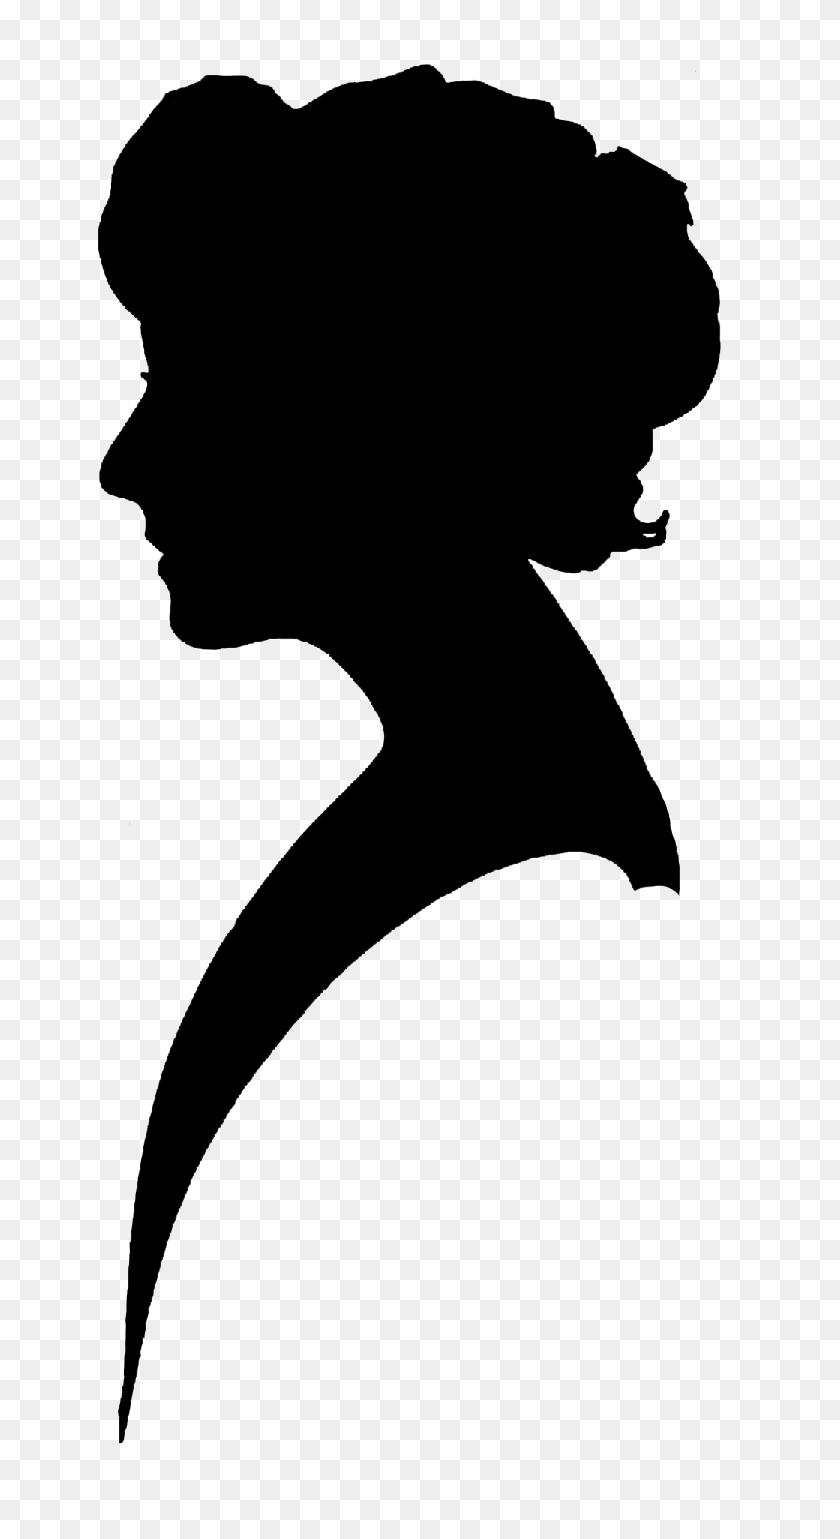 Clip Art Silhouette Female Heads Clipart - Woman Clipart